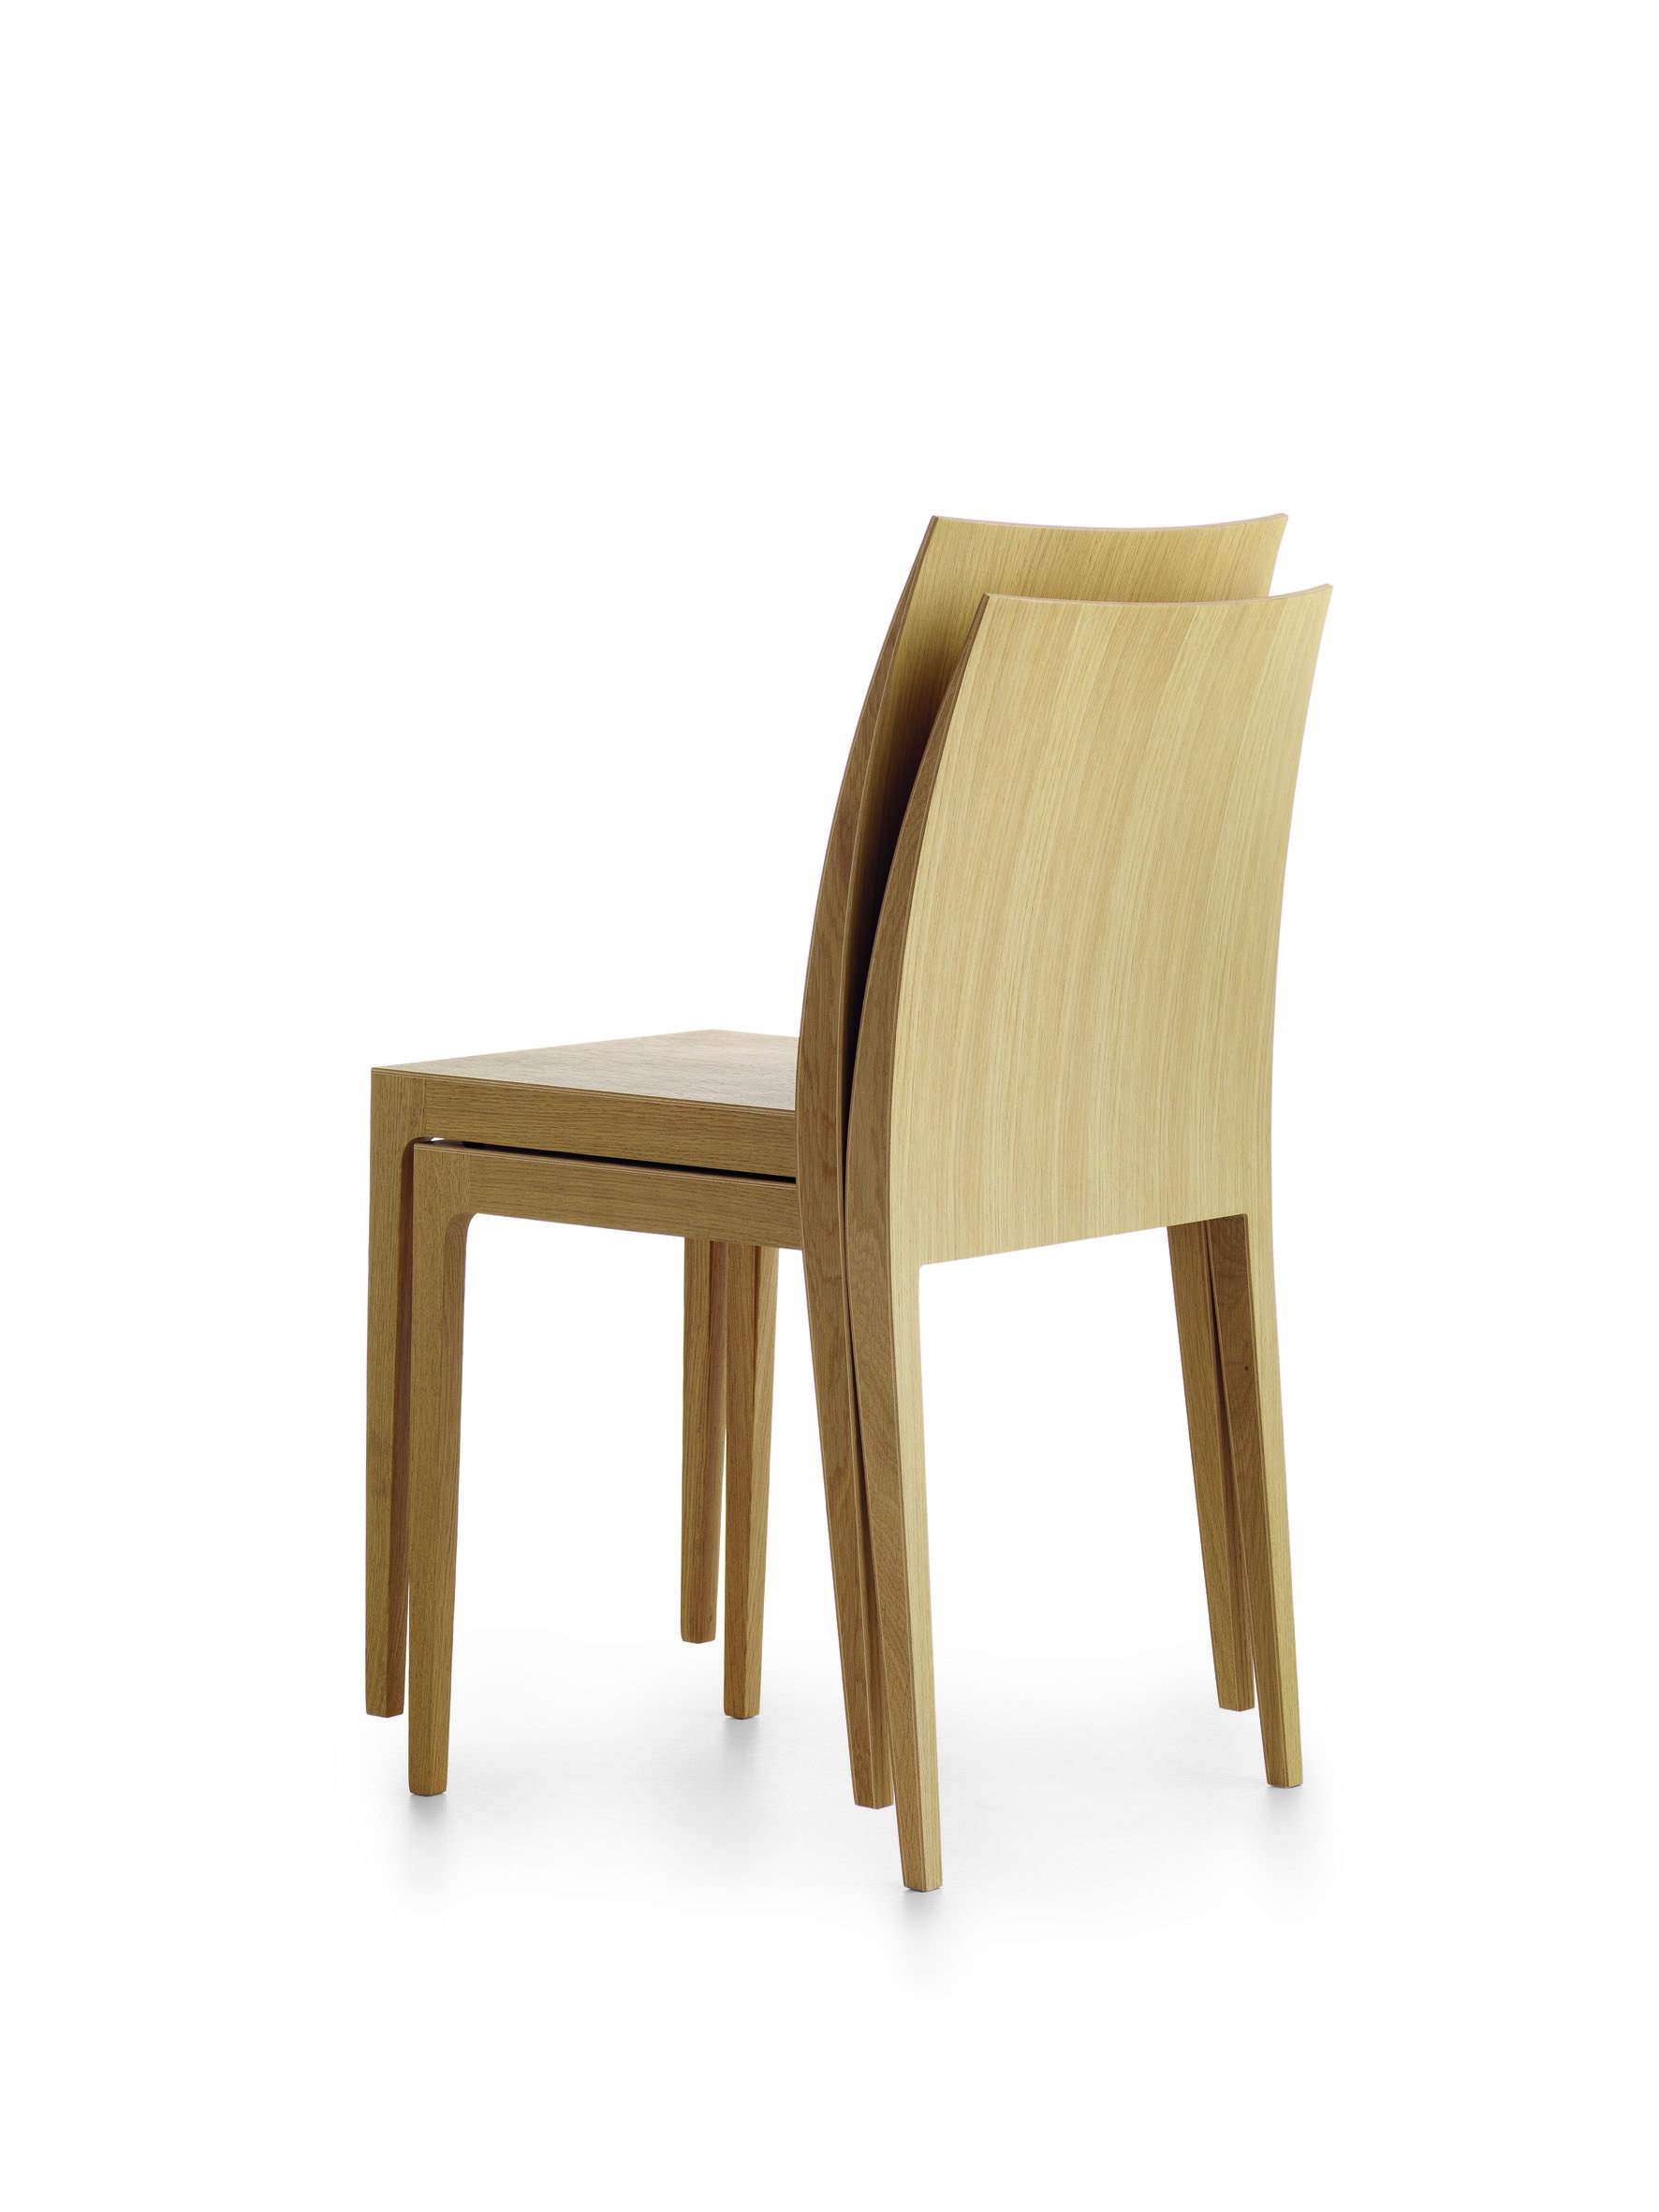 crassevig | chair, wooden chair